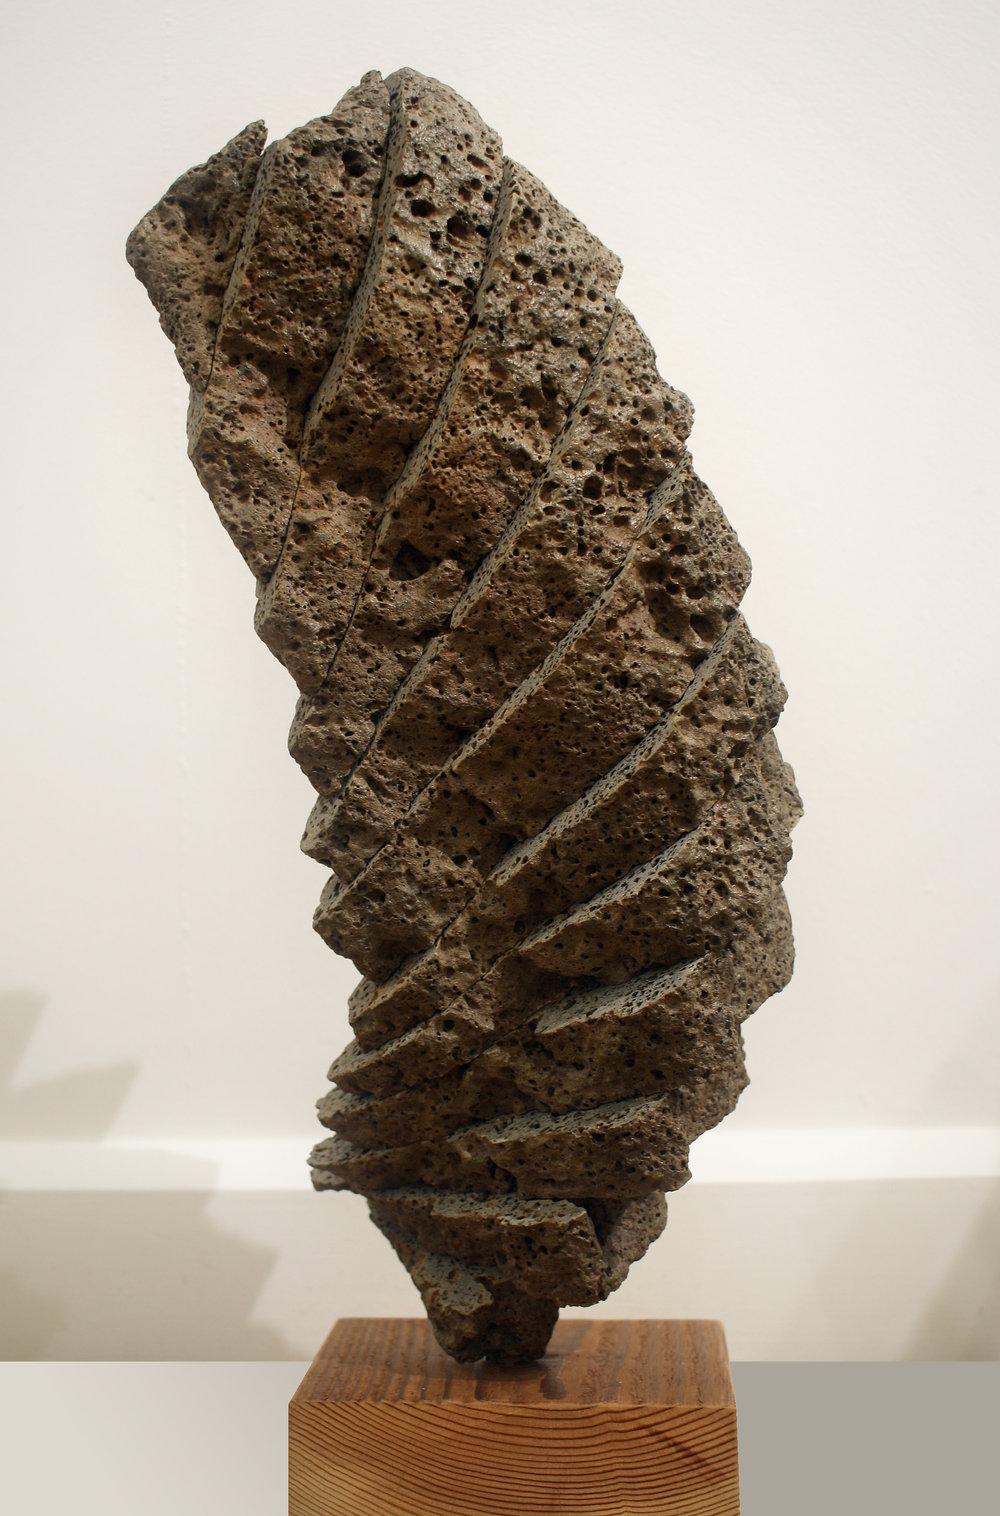 "$1500 - Guardian Figure (Suiseki VII), 6x""8x""22"", Basalt and Wood"